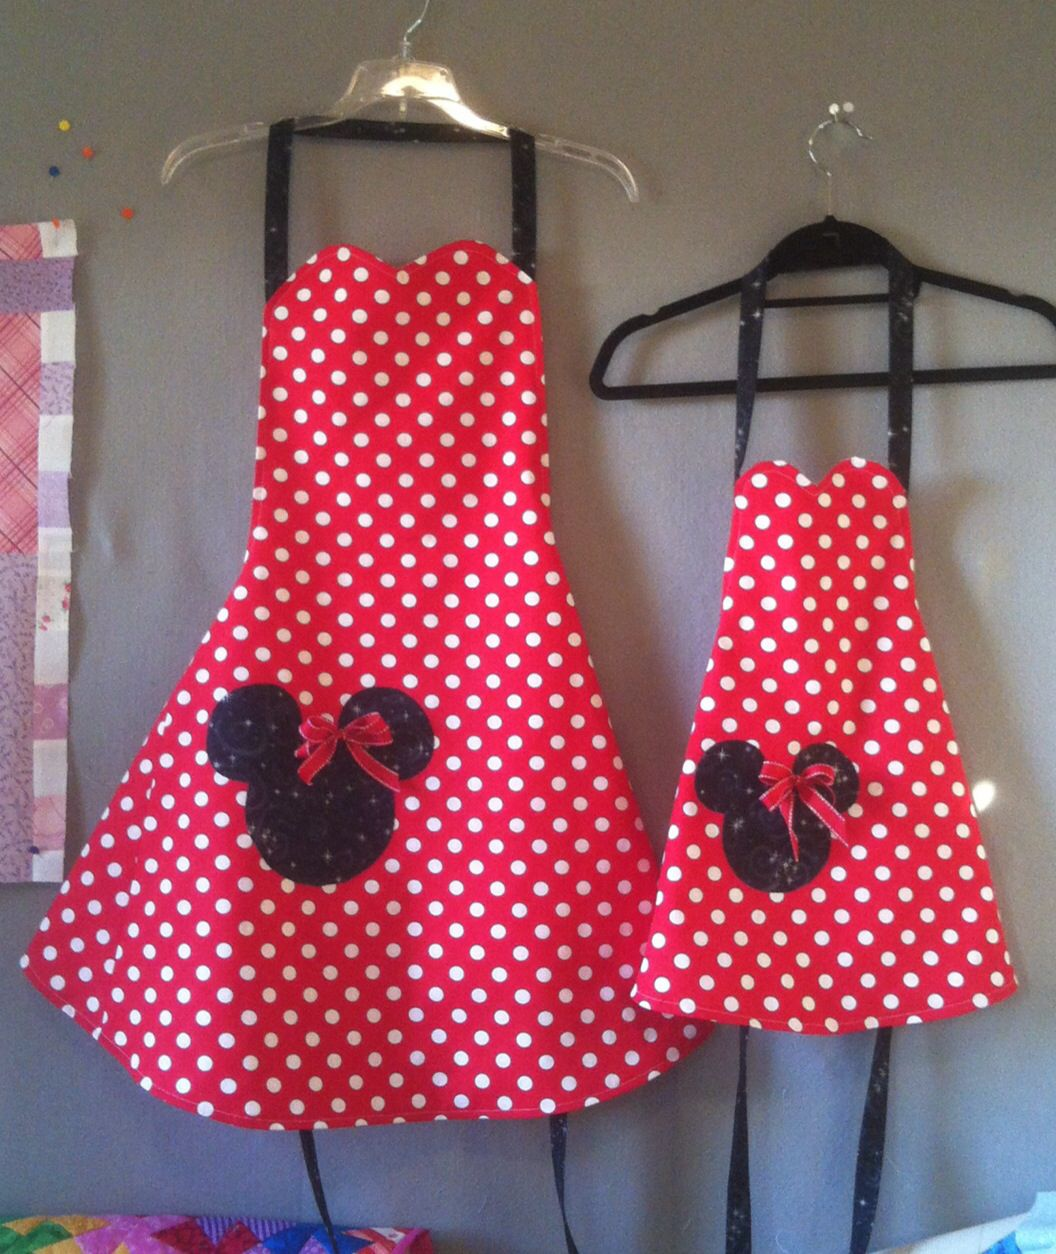 Mother Daughter Apron Set Minnie Mouse Apron Set Matching Aprons, Mother Son Apron Set